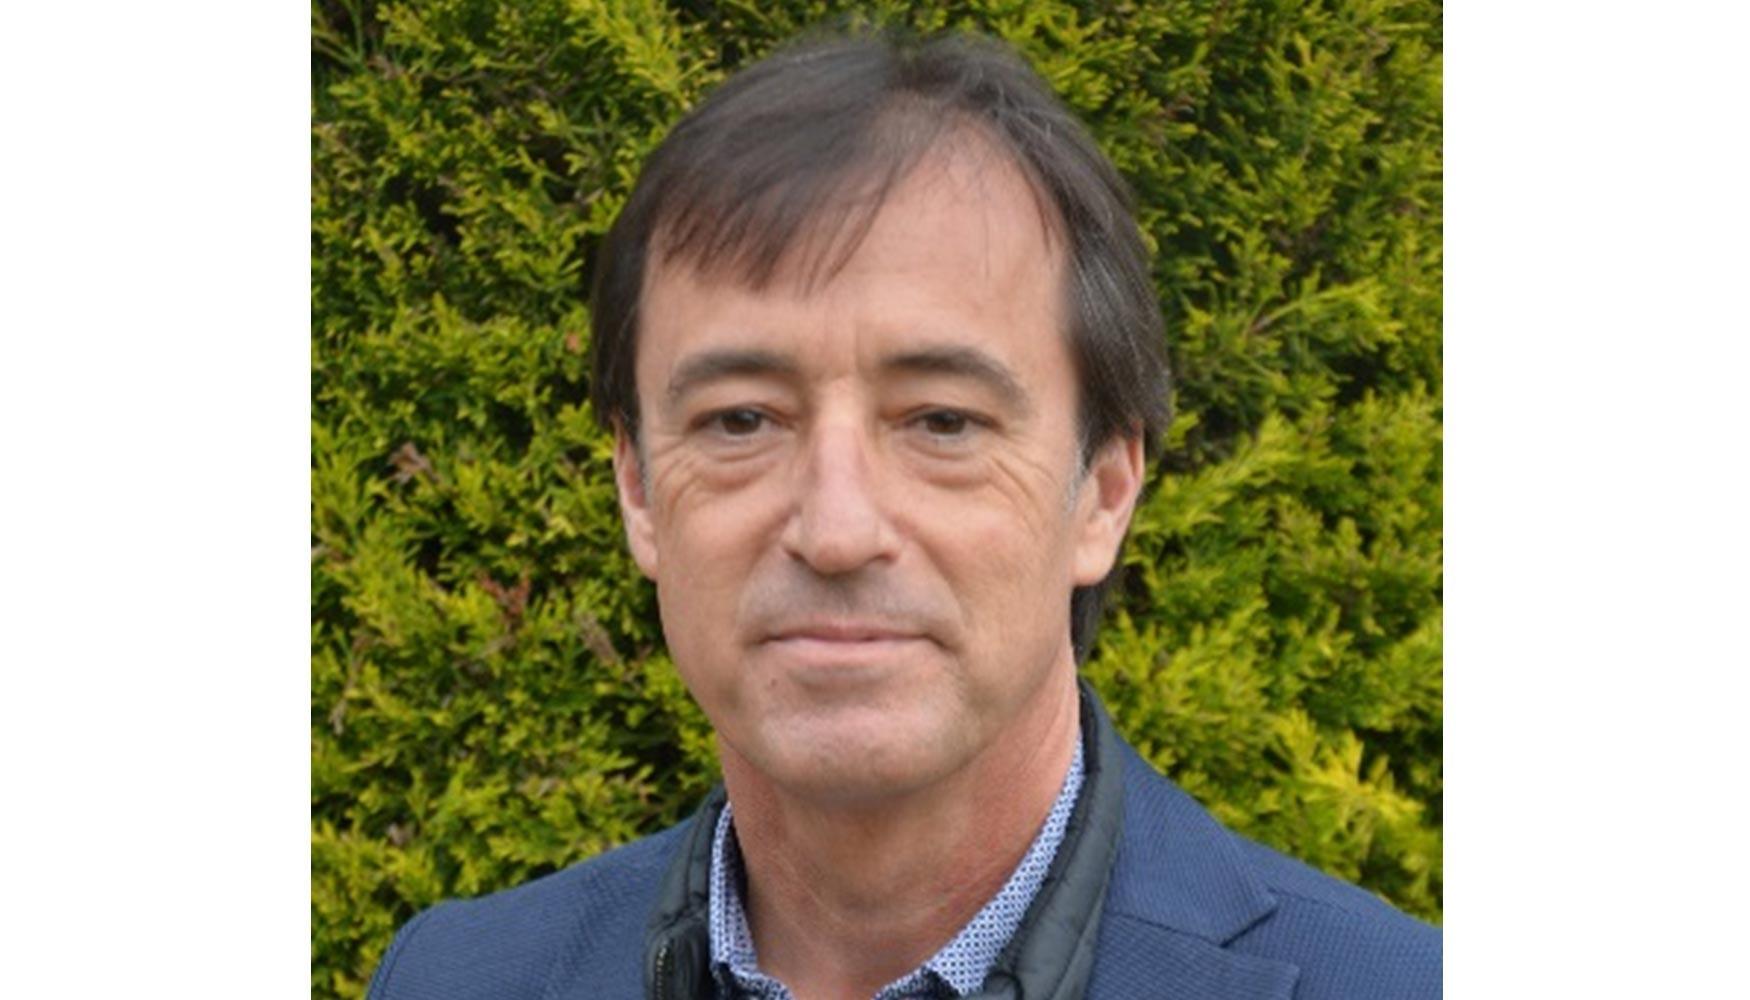 Ricard navarro nuevo director de bur s sau jardiner a for Jardineria navarro